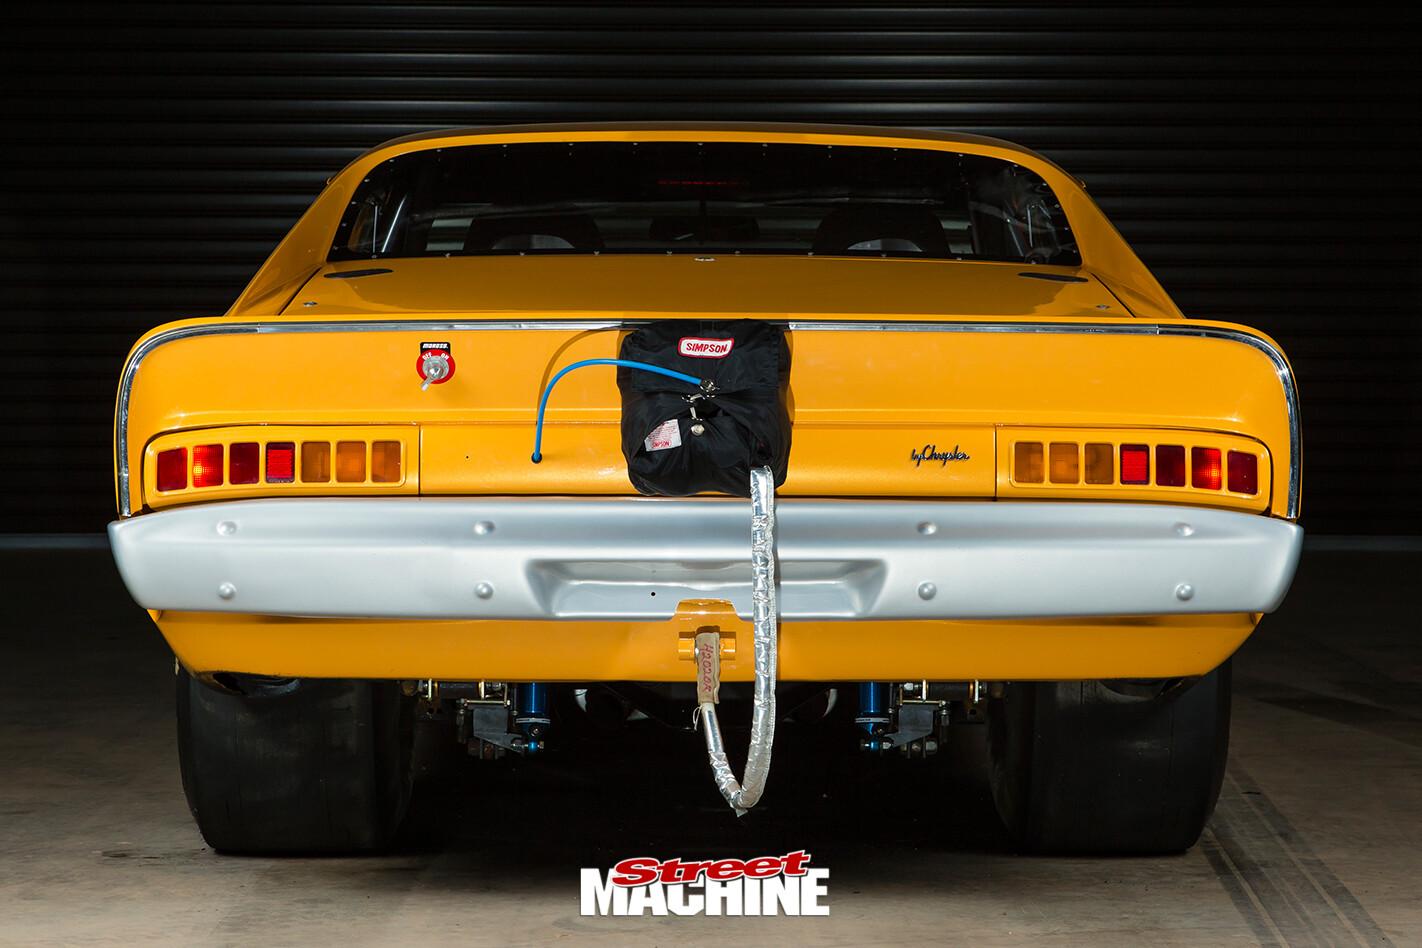 Chrysler -valiant -e 55-charger -rear -view